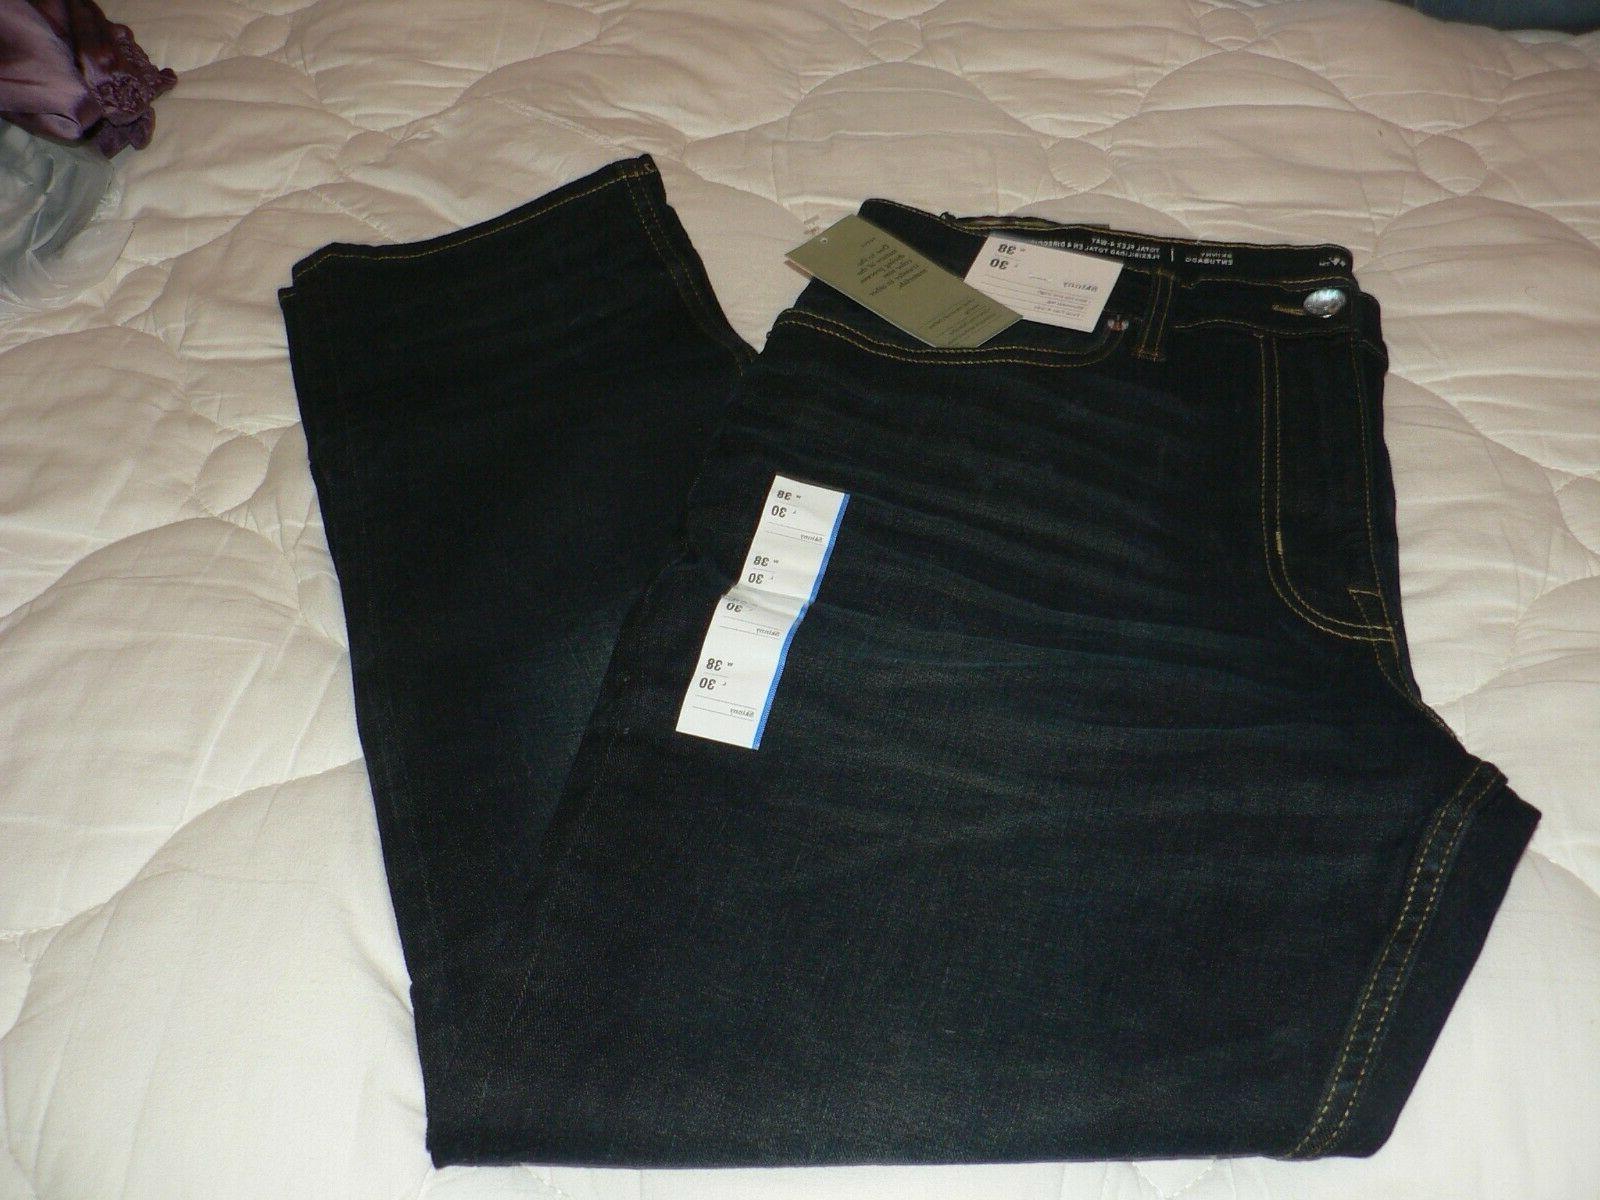 Goodfellow Co Jeans Skinny